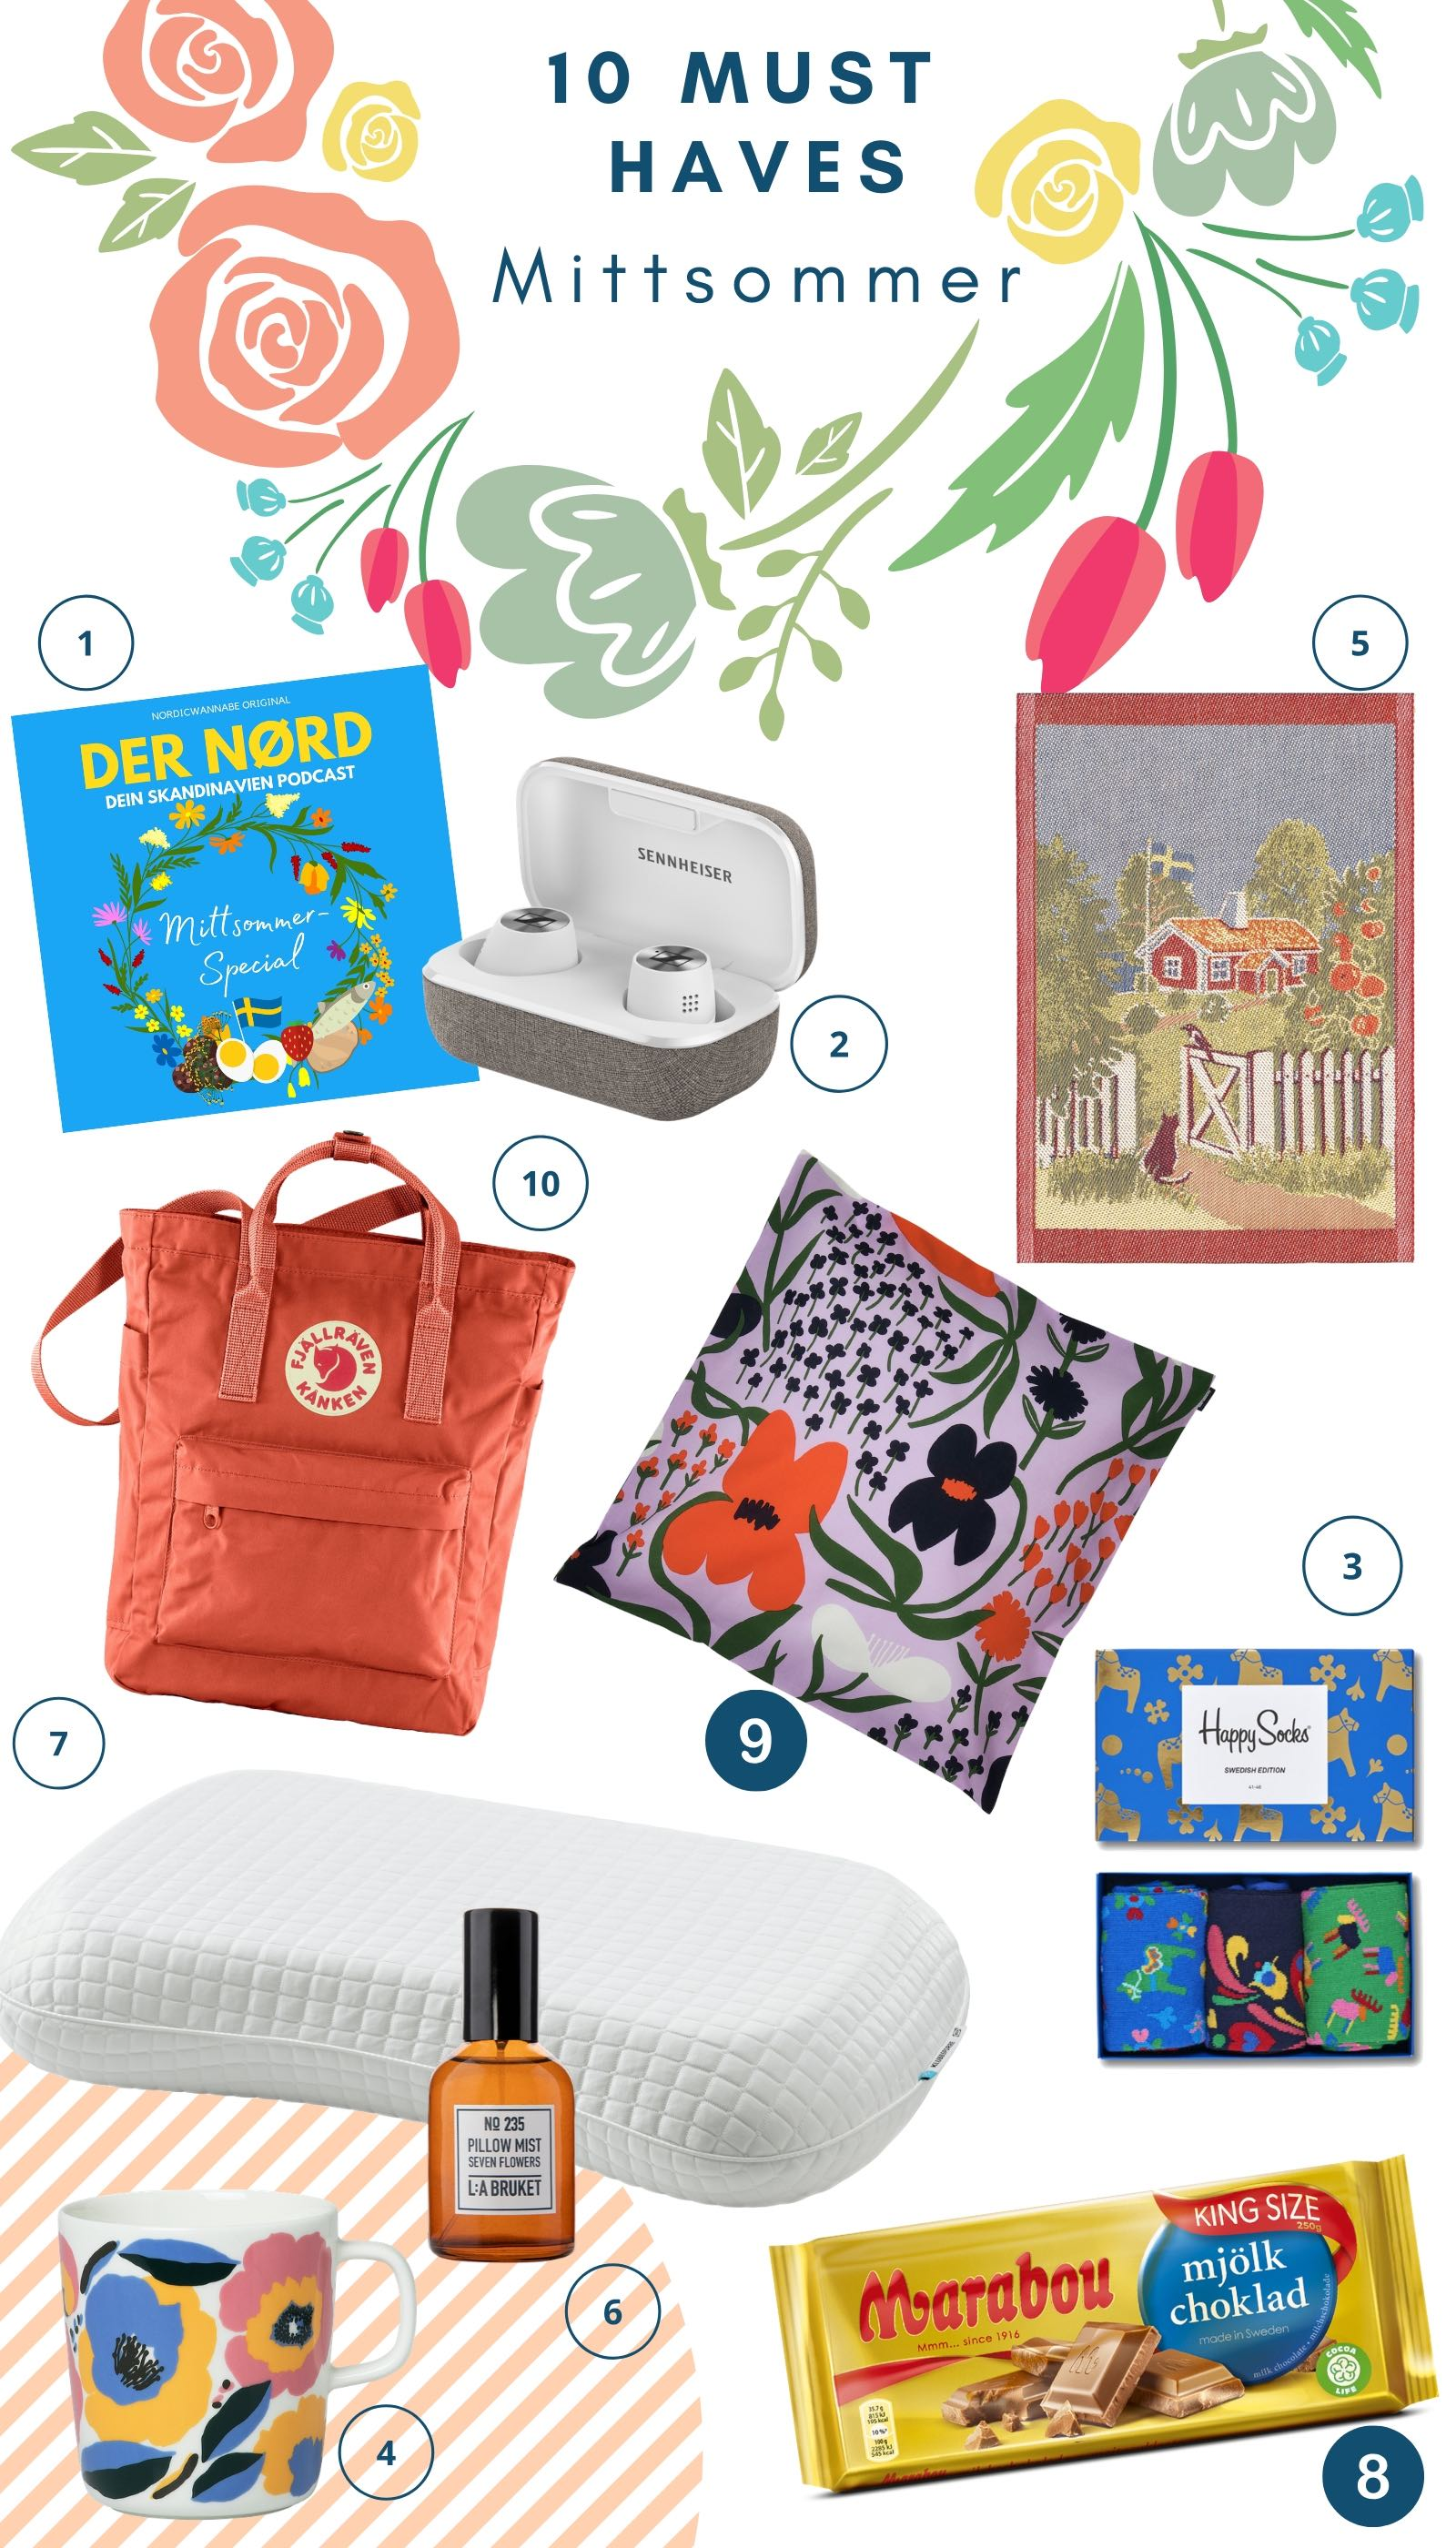 10 Must Haves, Mittsommerfest, IKEA